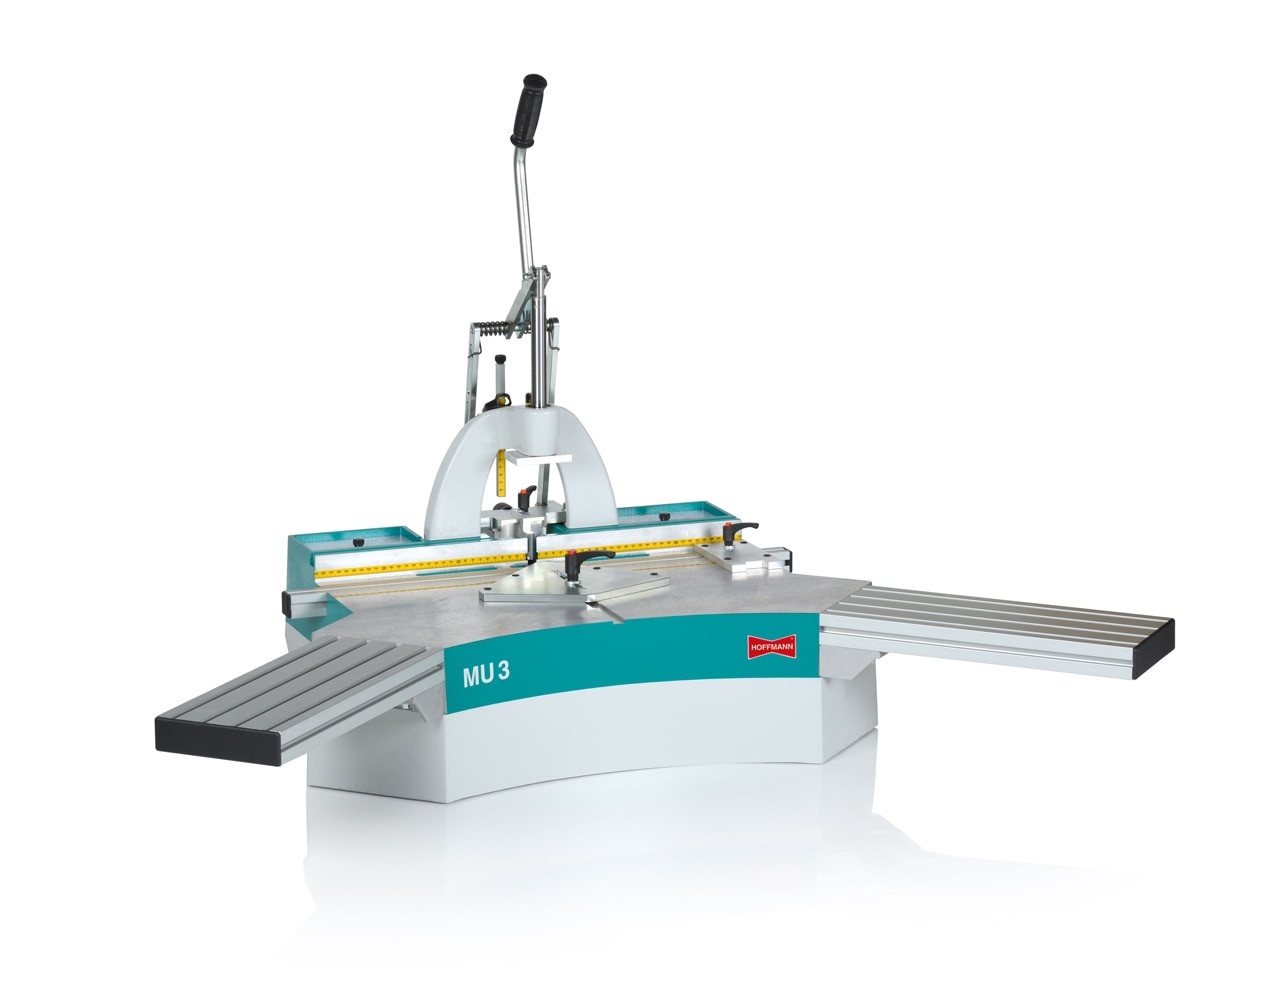 Hoffmann MU3 Manual Dovetail Routing Machine